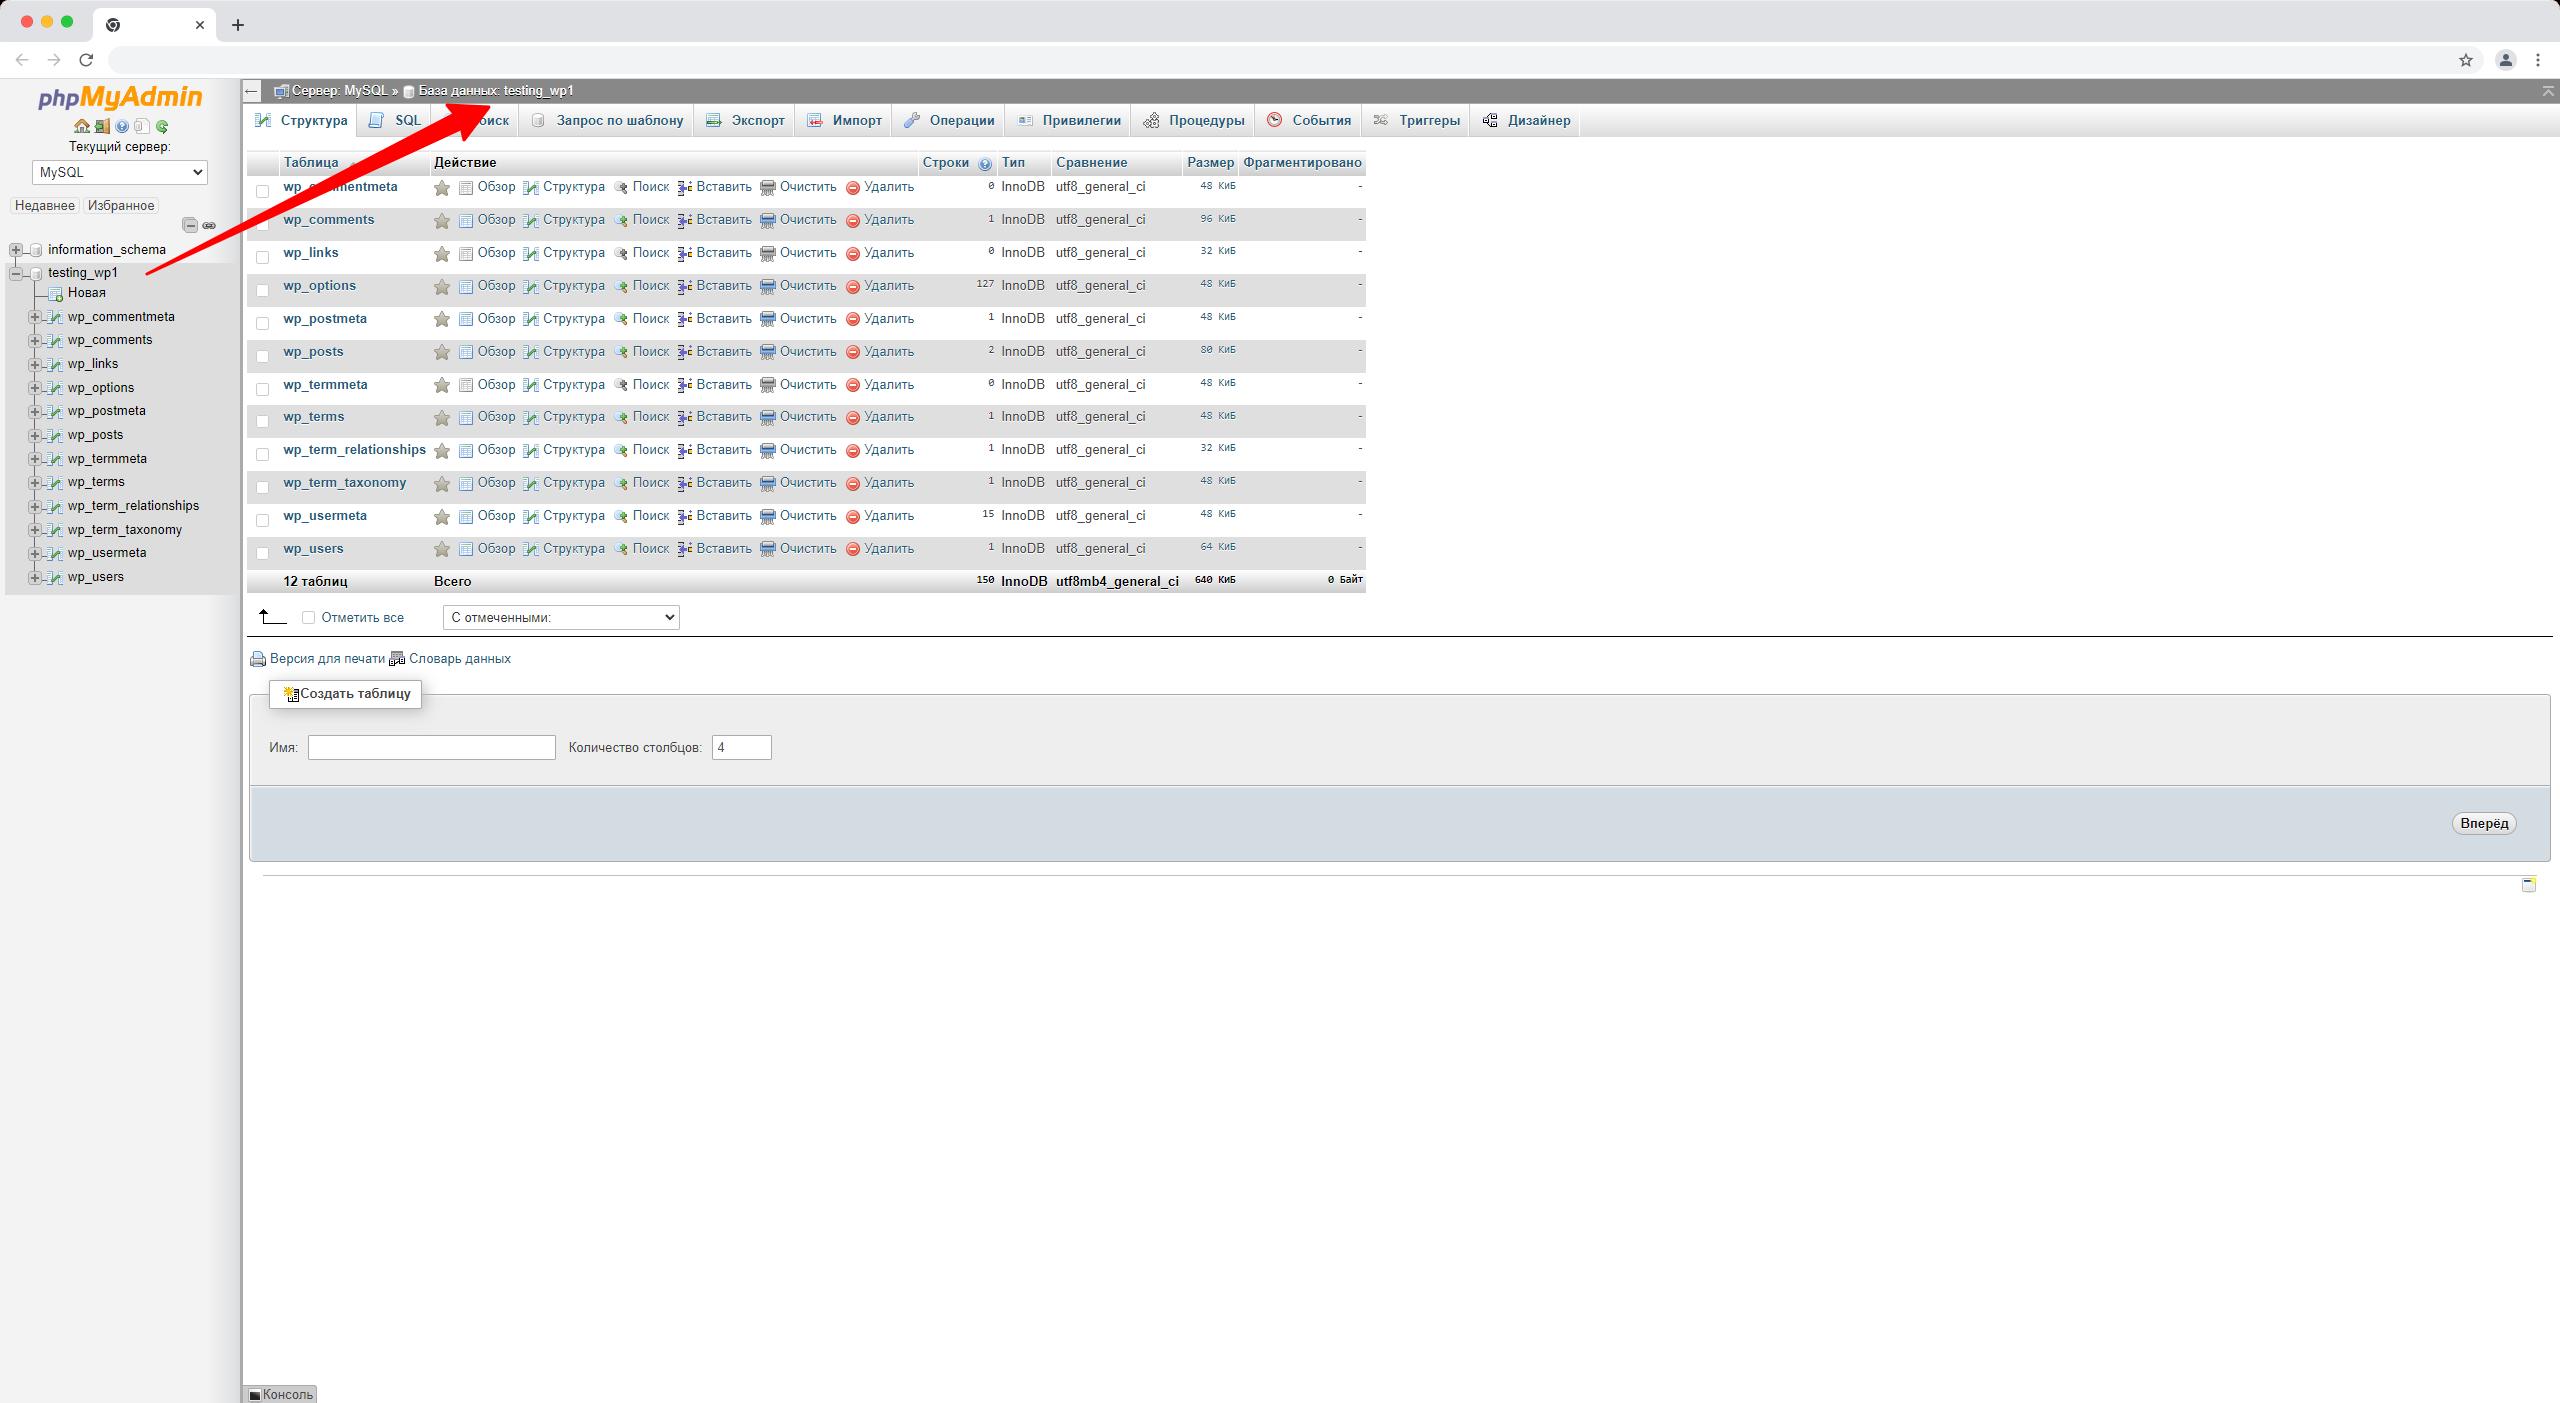 https://webhost1.ru/upload/help/ispmgr/screenshots/tools-phpmyadmin.png